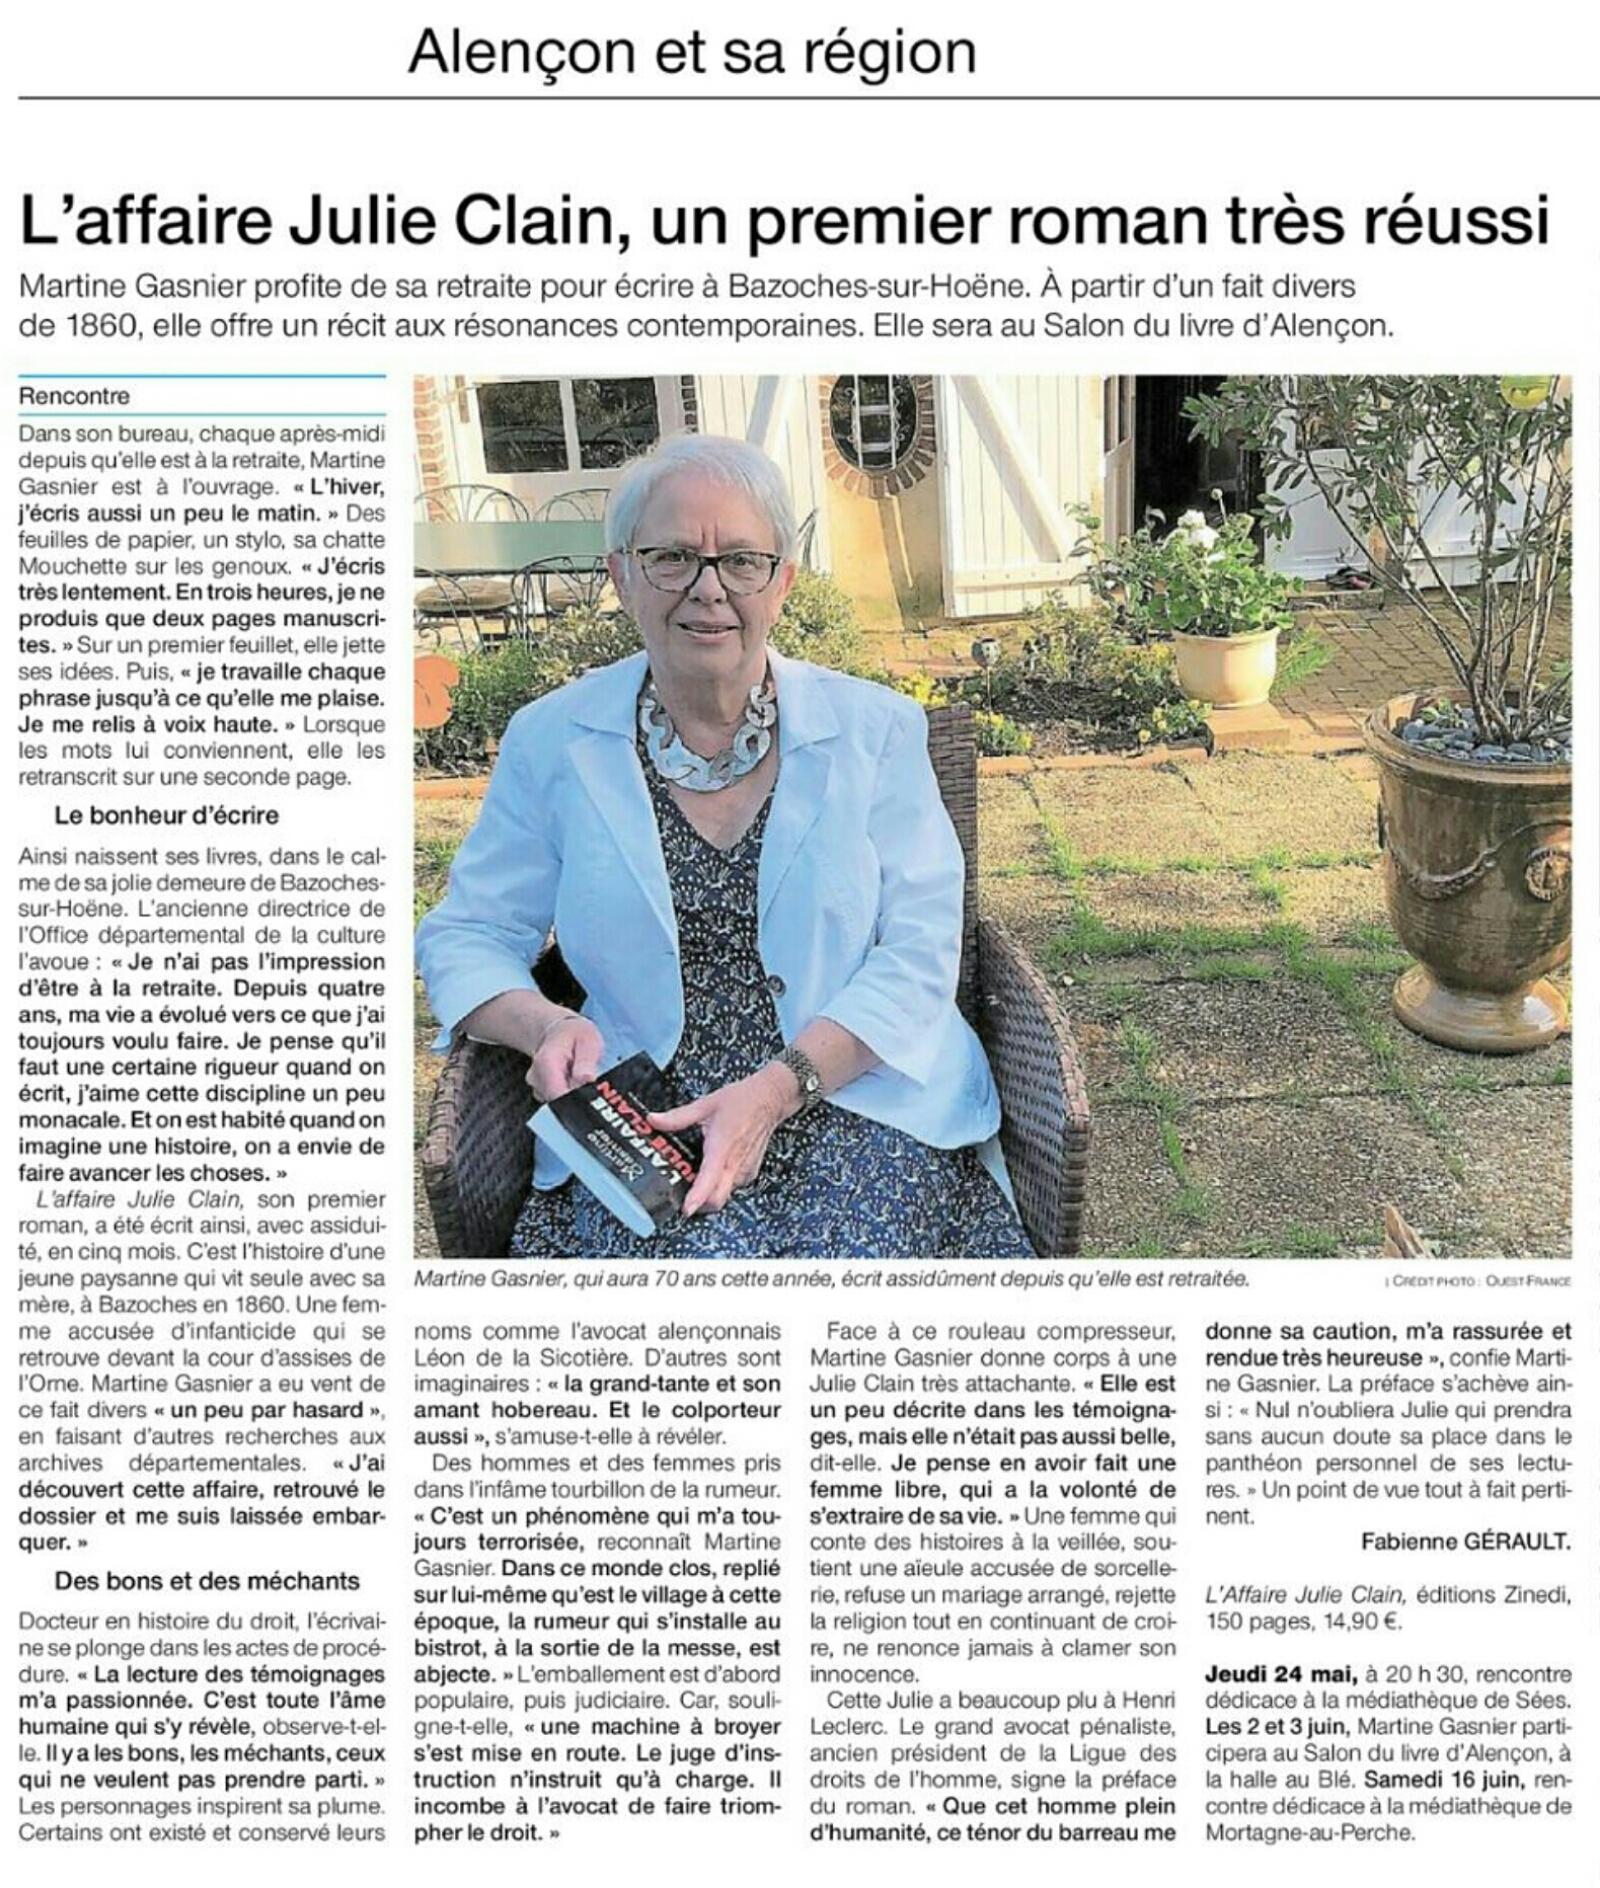 Ouest france art. du 24 mai 2018